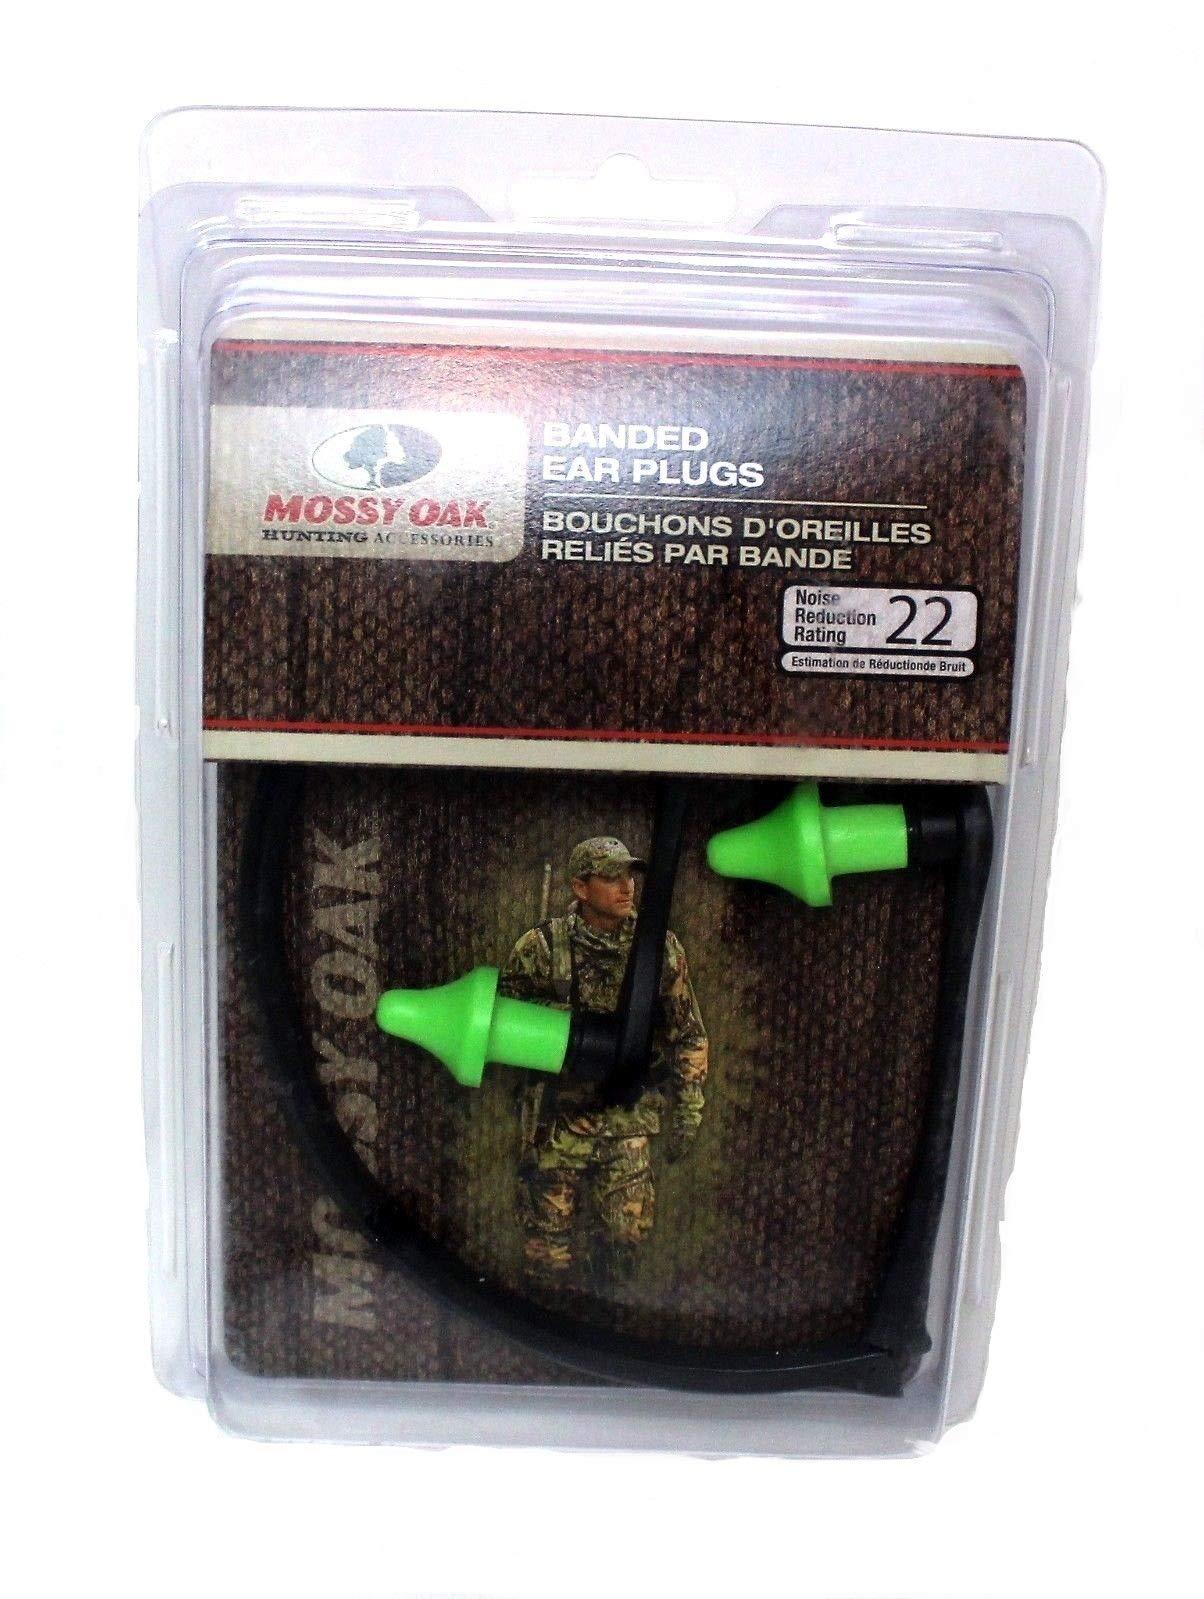 Mossy Oak Banded NRR22 Ear Plugs (Black/Green, One size) by Mossy Oak Hunting Accessories